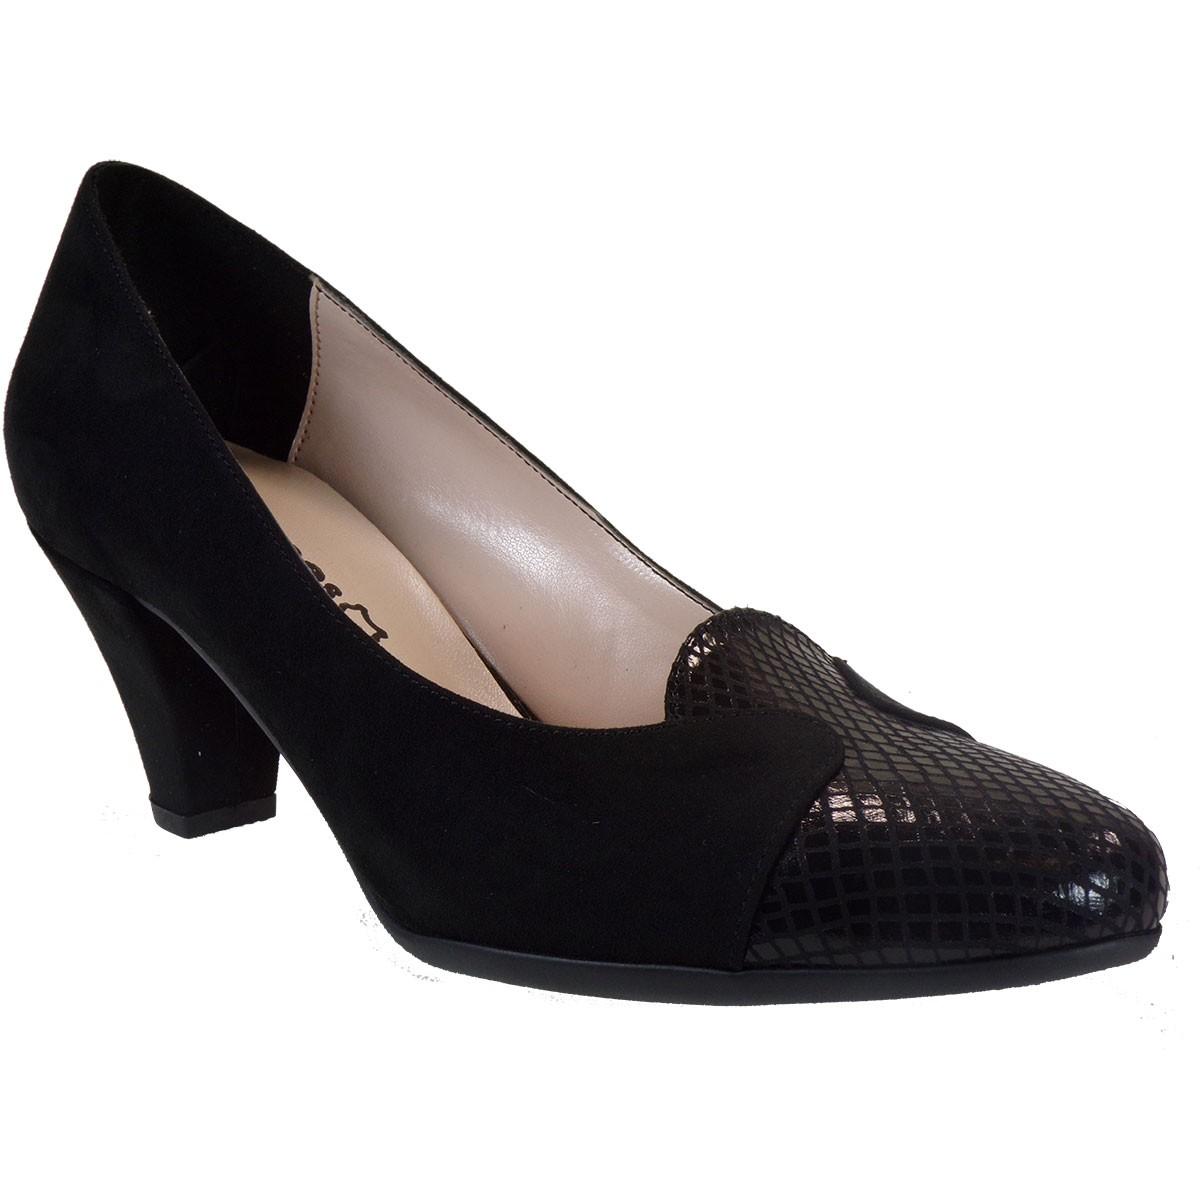 Katia Shoes Γυναικεία Παπούτσια Γόβες 55-872 Μαύρο Φίδι